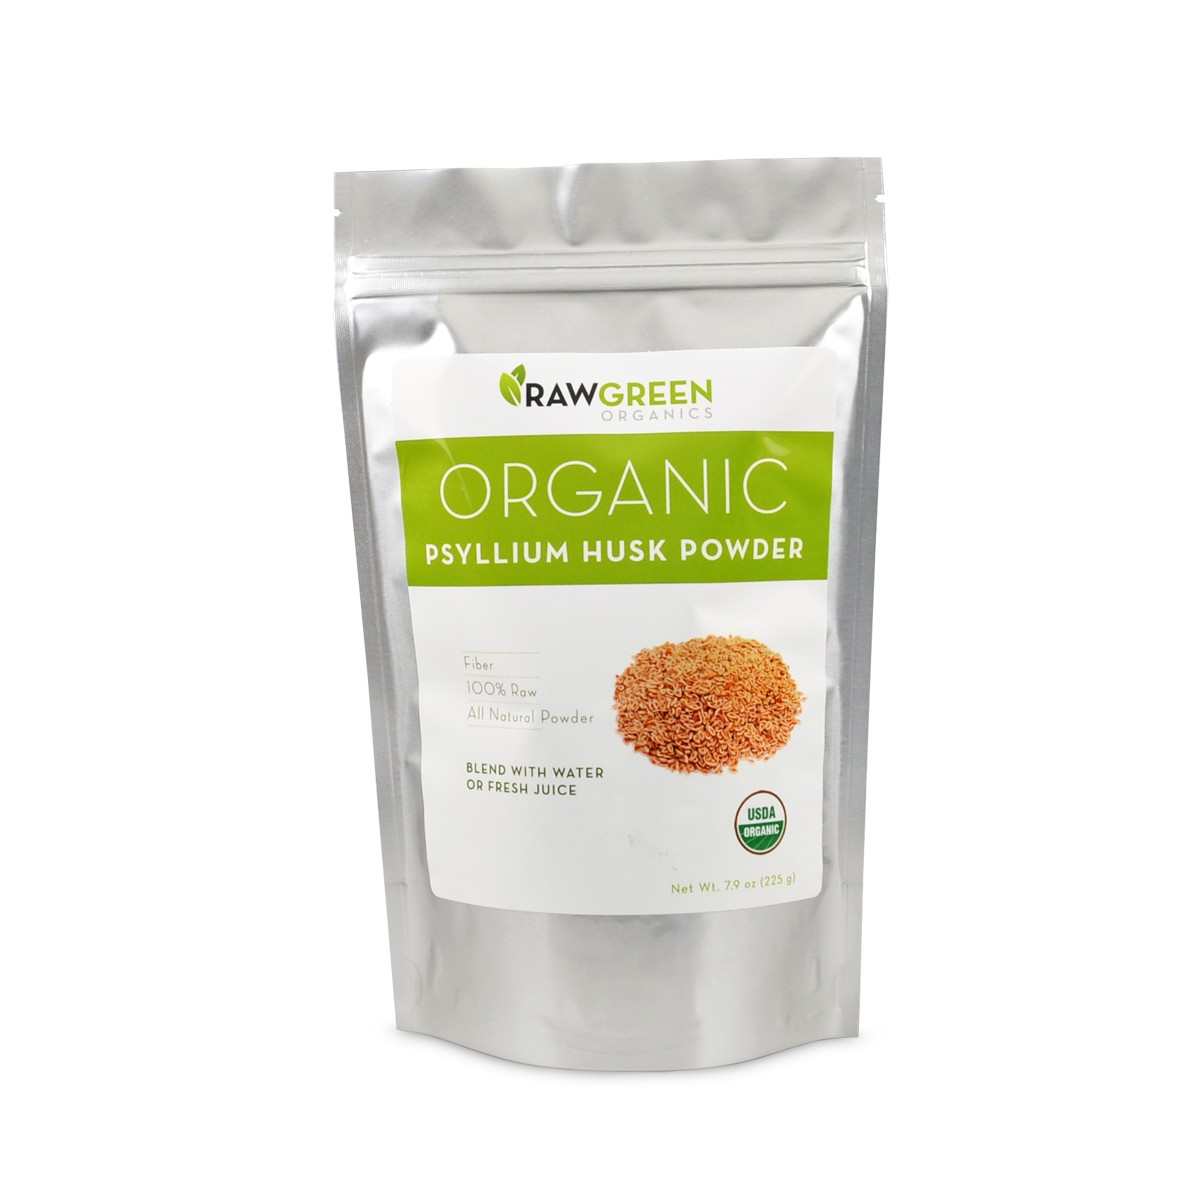 Organic Psyllium Husk Powder 8oz Walmartcom